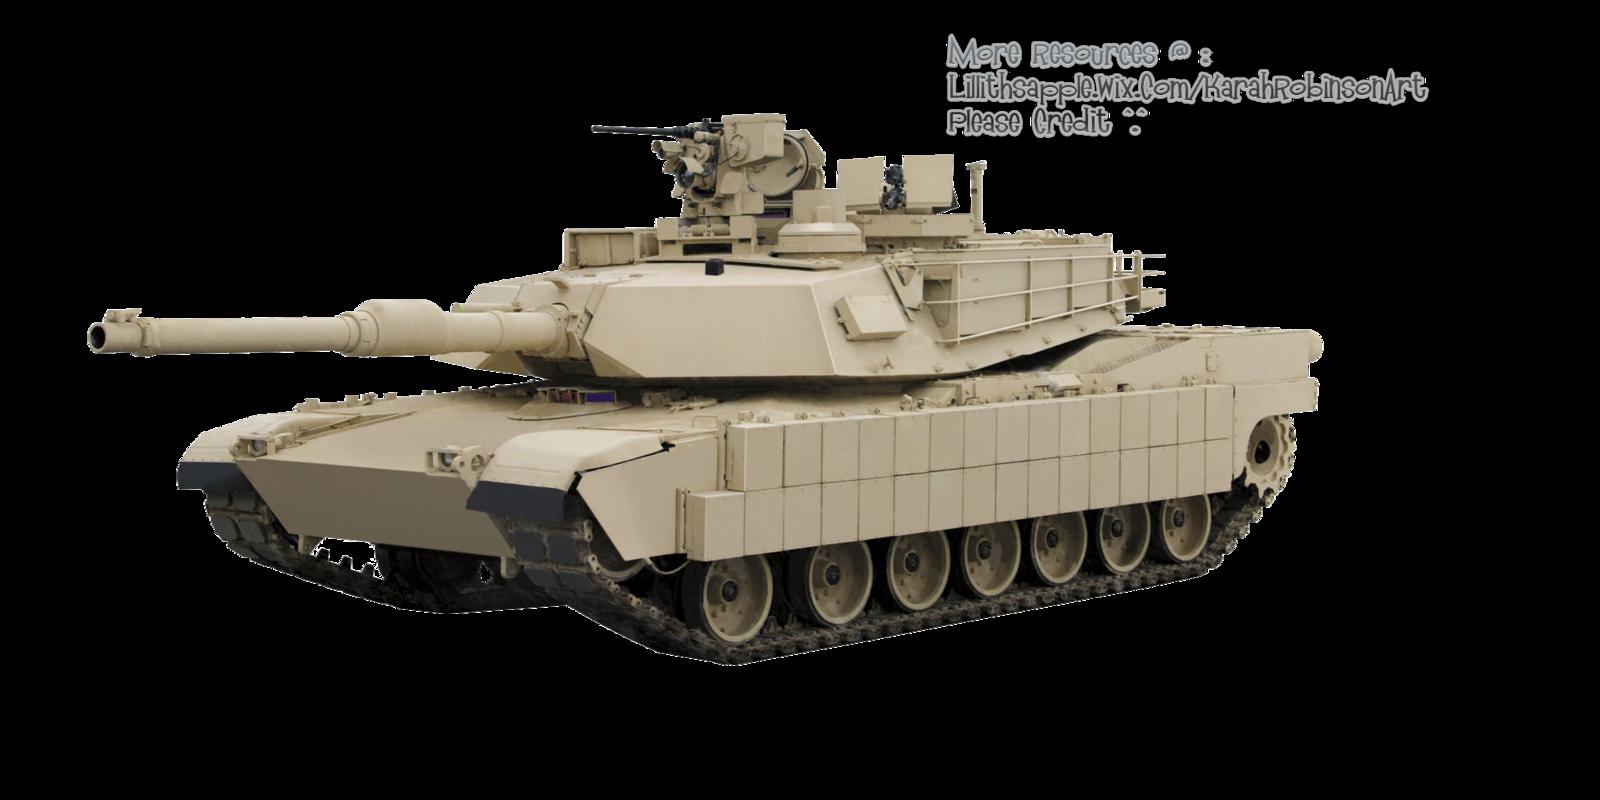 Drawing at getdrawings com. Military clipart simple tank